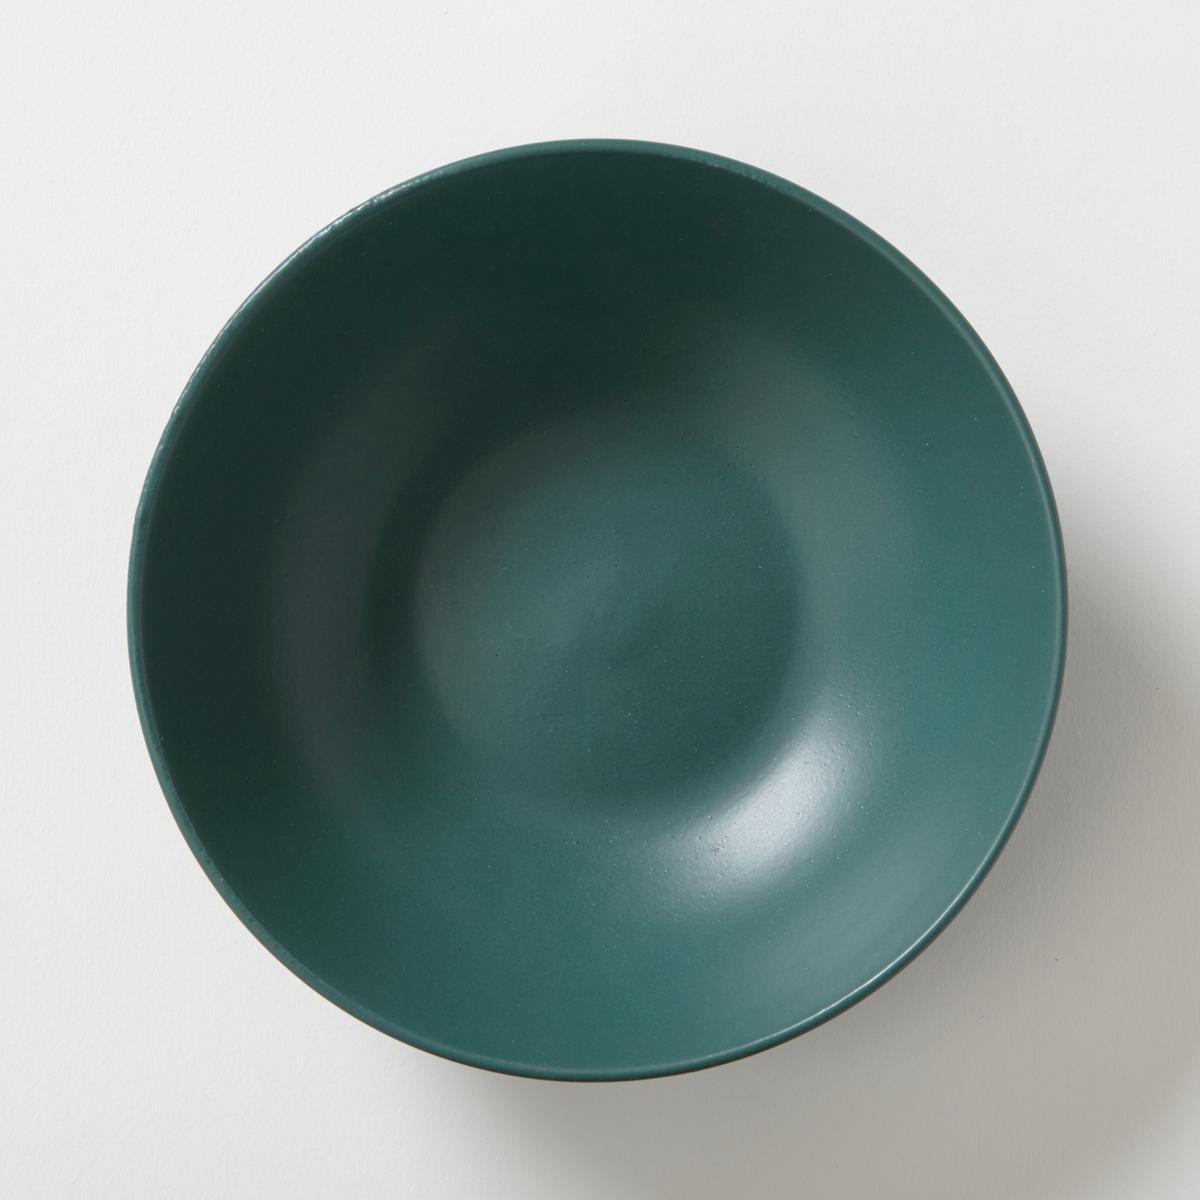 4 тарелки глубокие из матового фарфора, Abessi